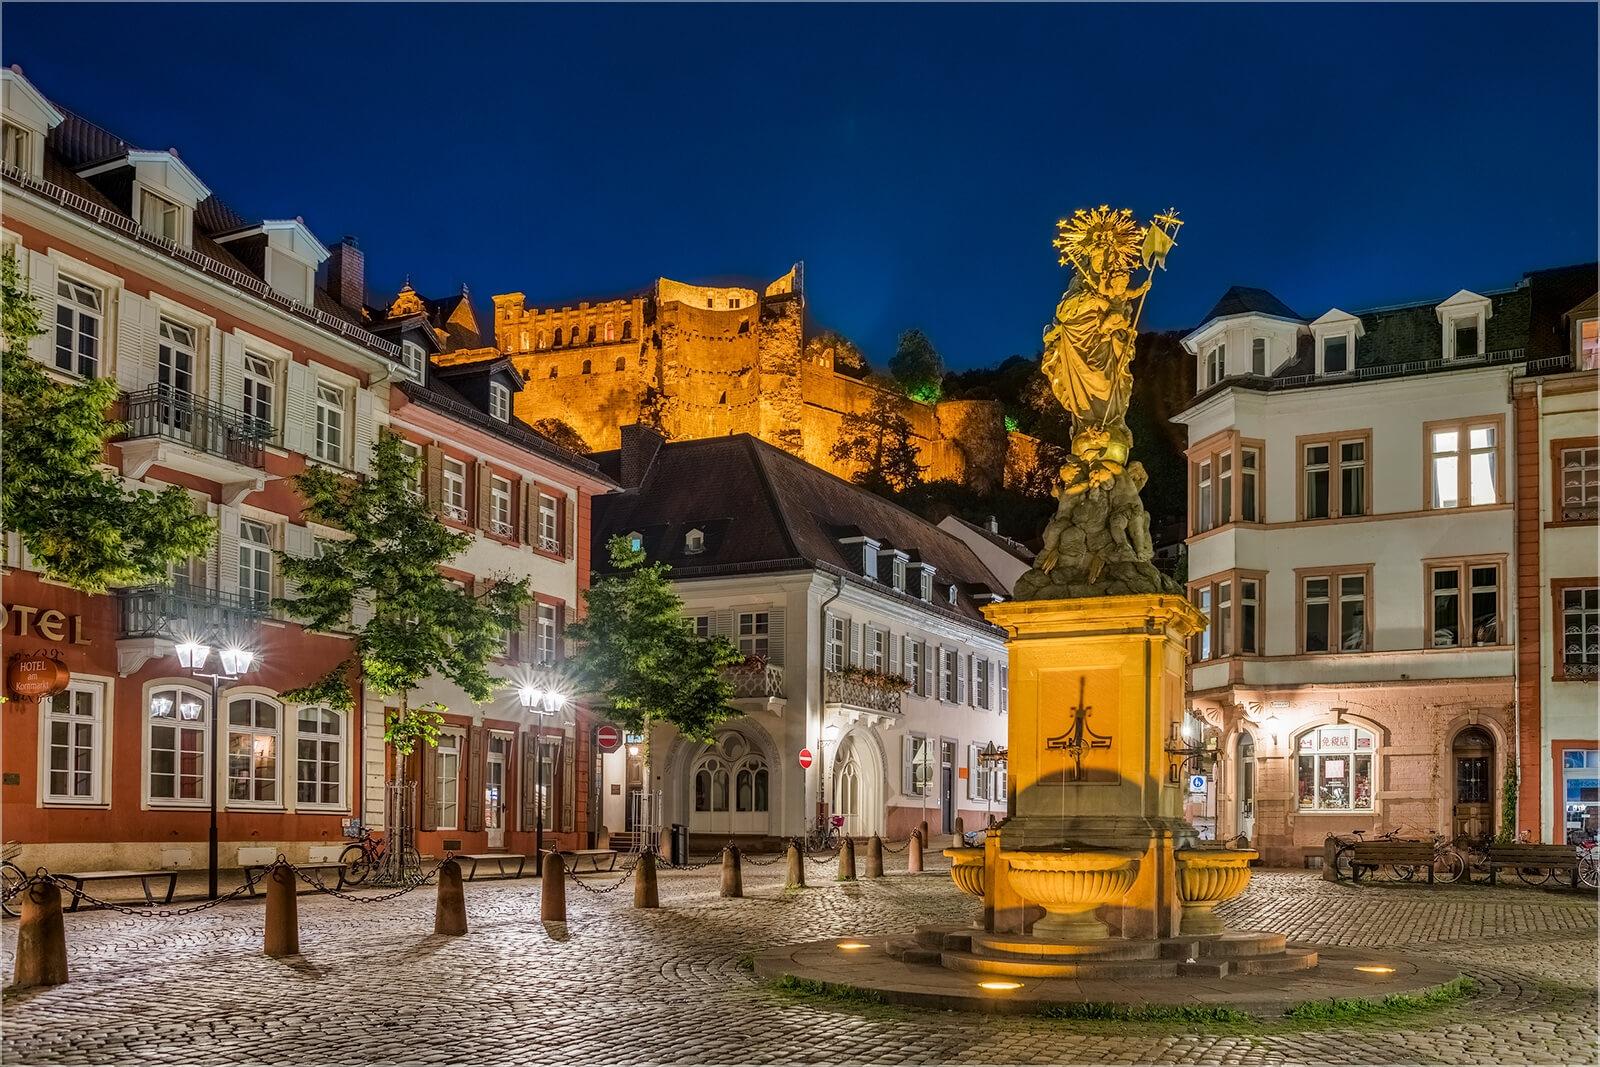 Wanddeko Heidelberg am Kornmarkt